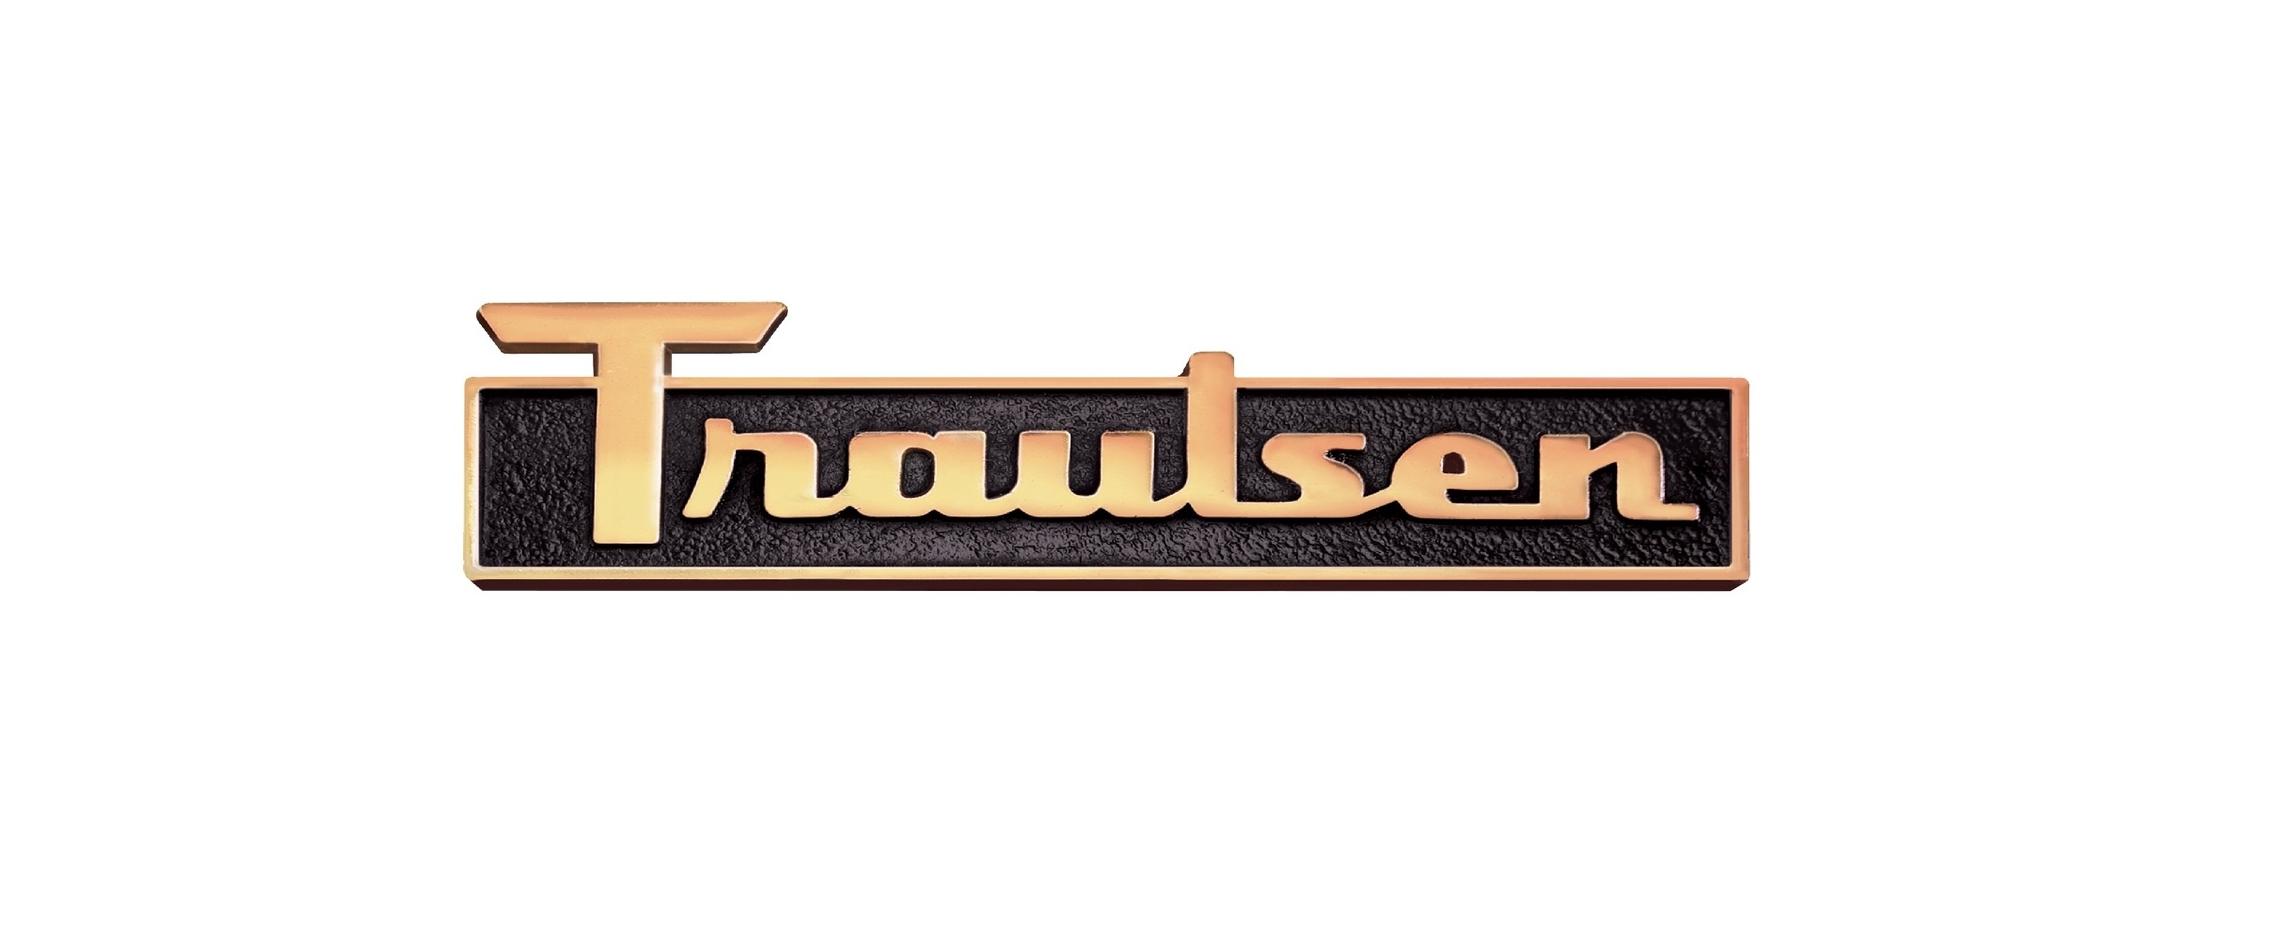 Traulsen logo.jpg